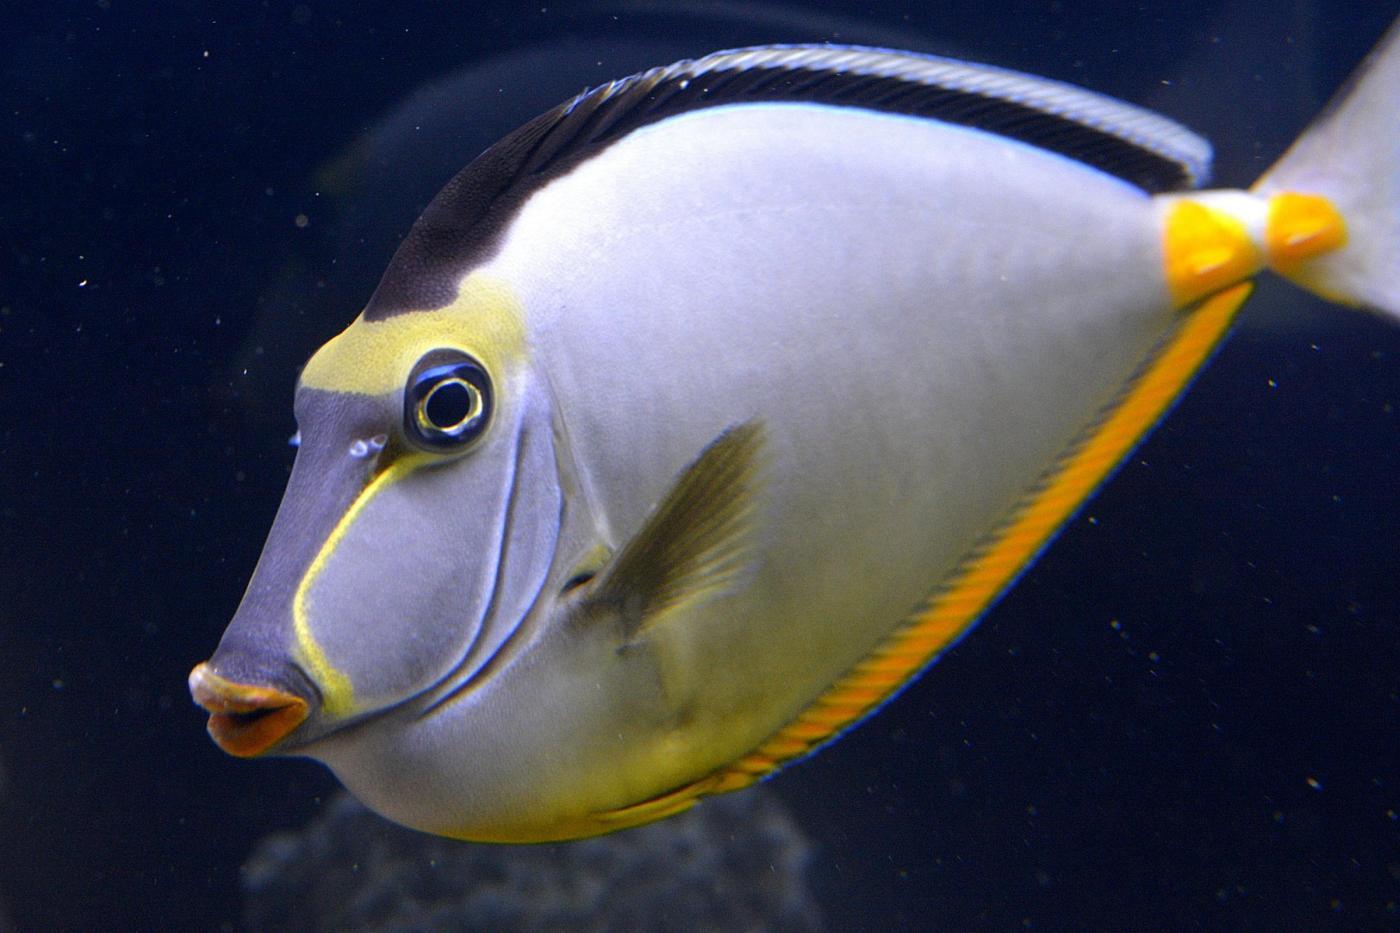 Pesce bianco a strisce gialle e blu